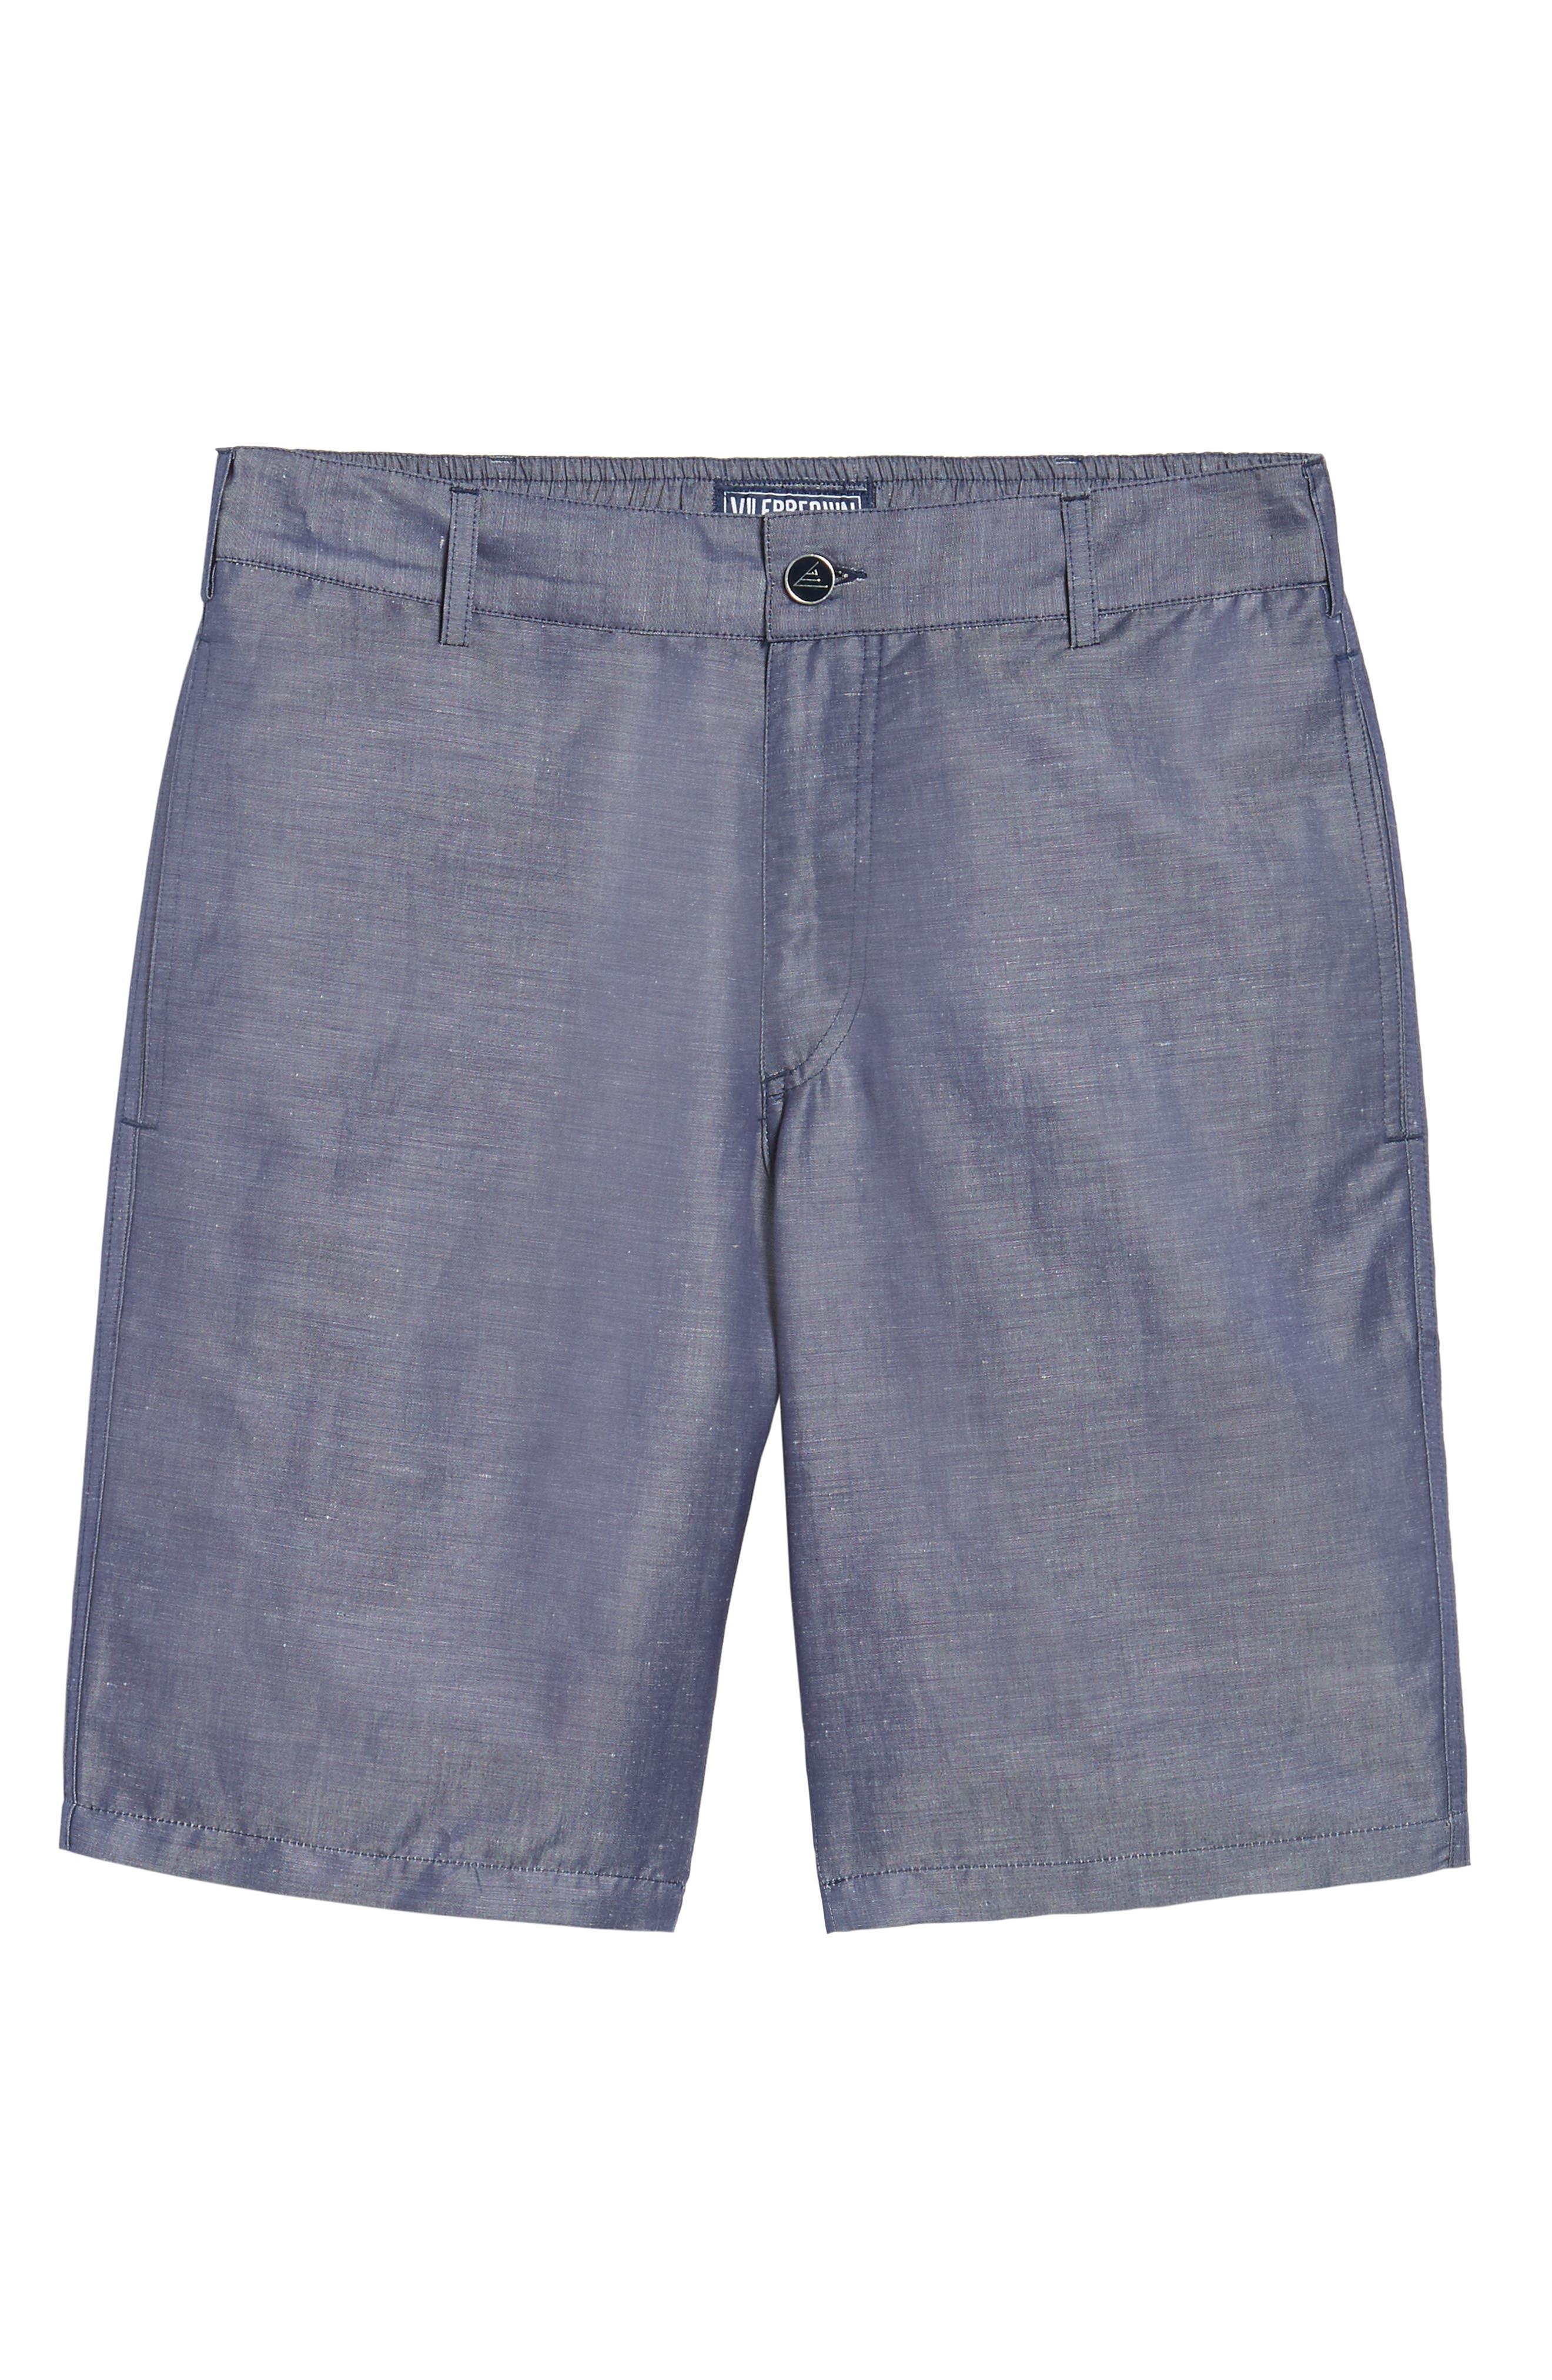 Linen Blend Bermuda Shorts,                             Alternate thumbnail 6, color,                             Blue Jean